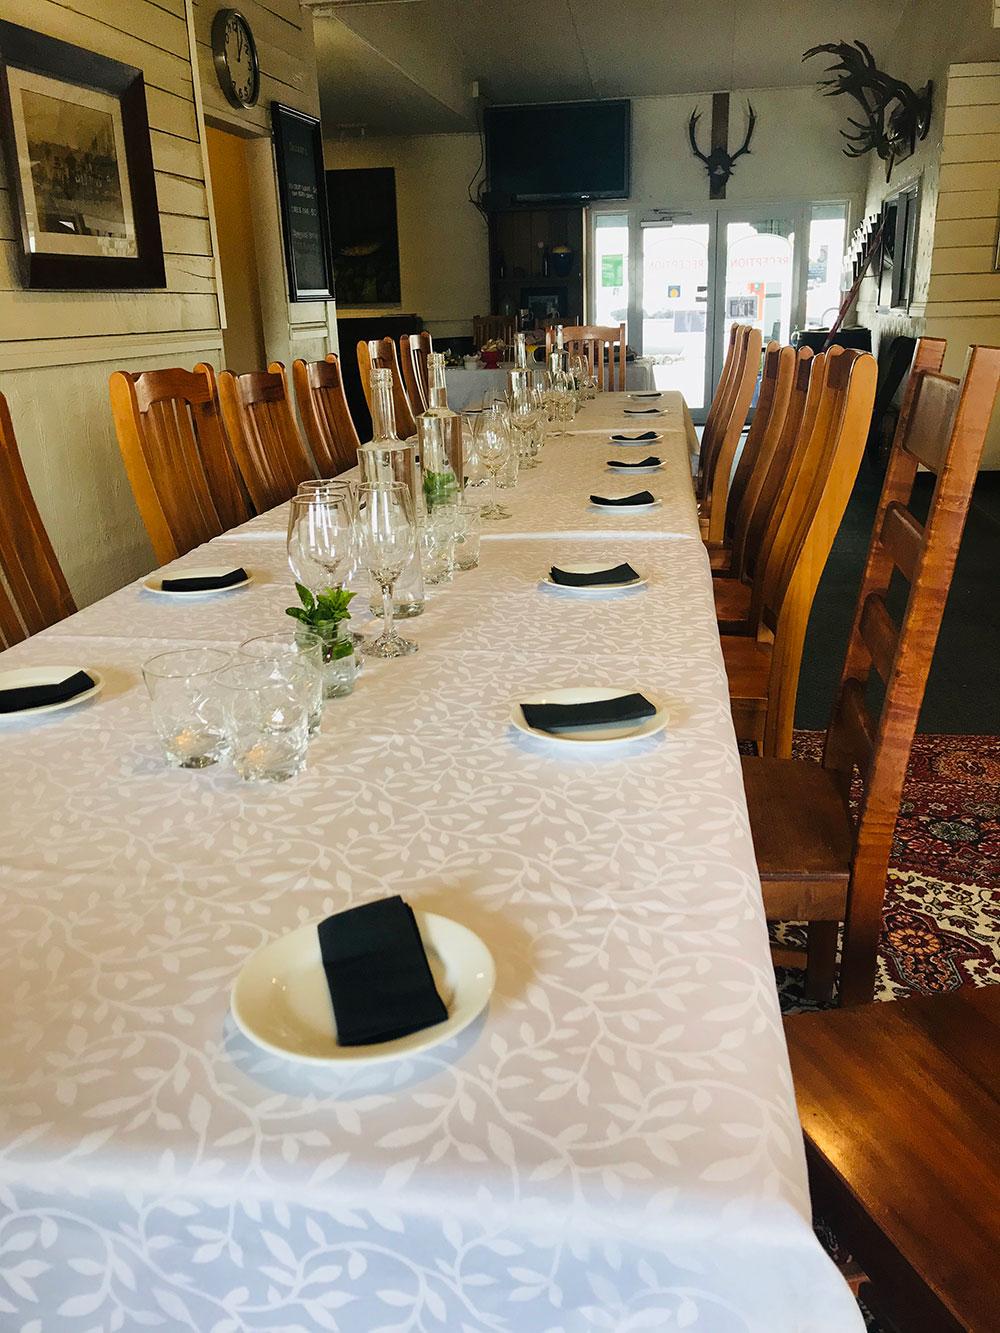 Dining at Dawsons Hotel in Reefton NZ